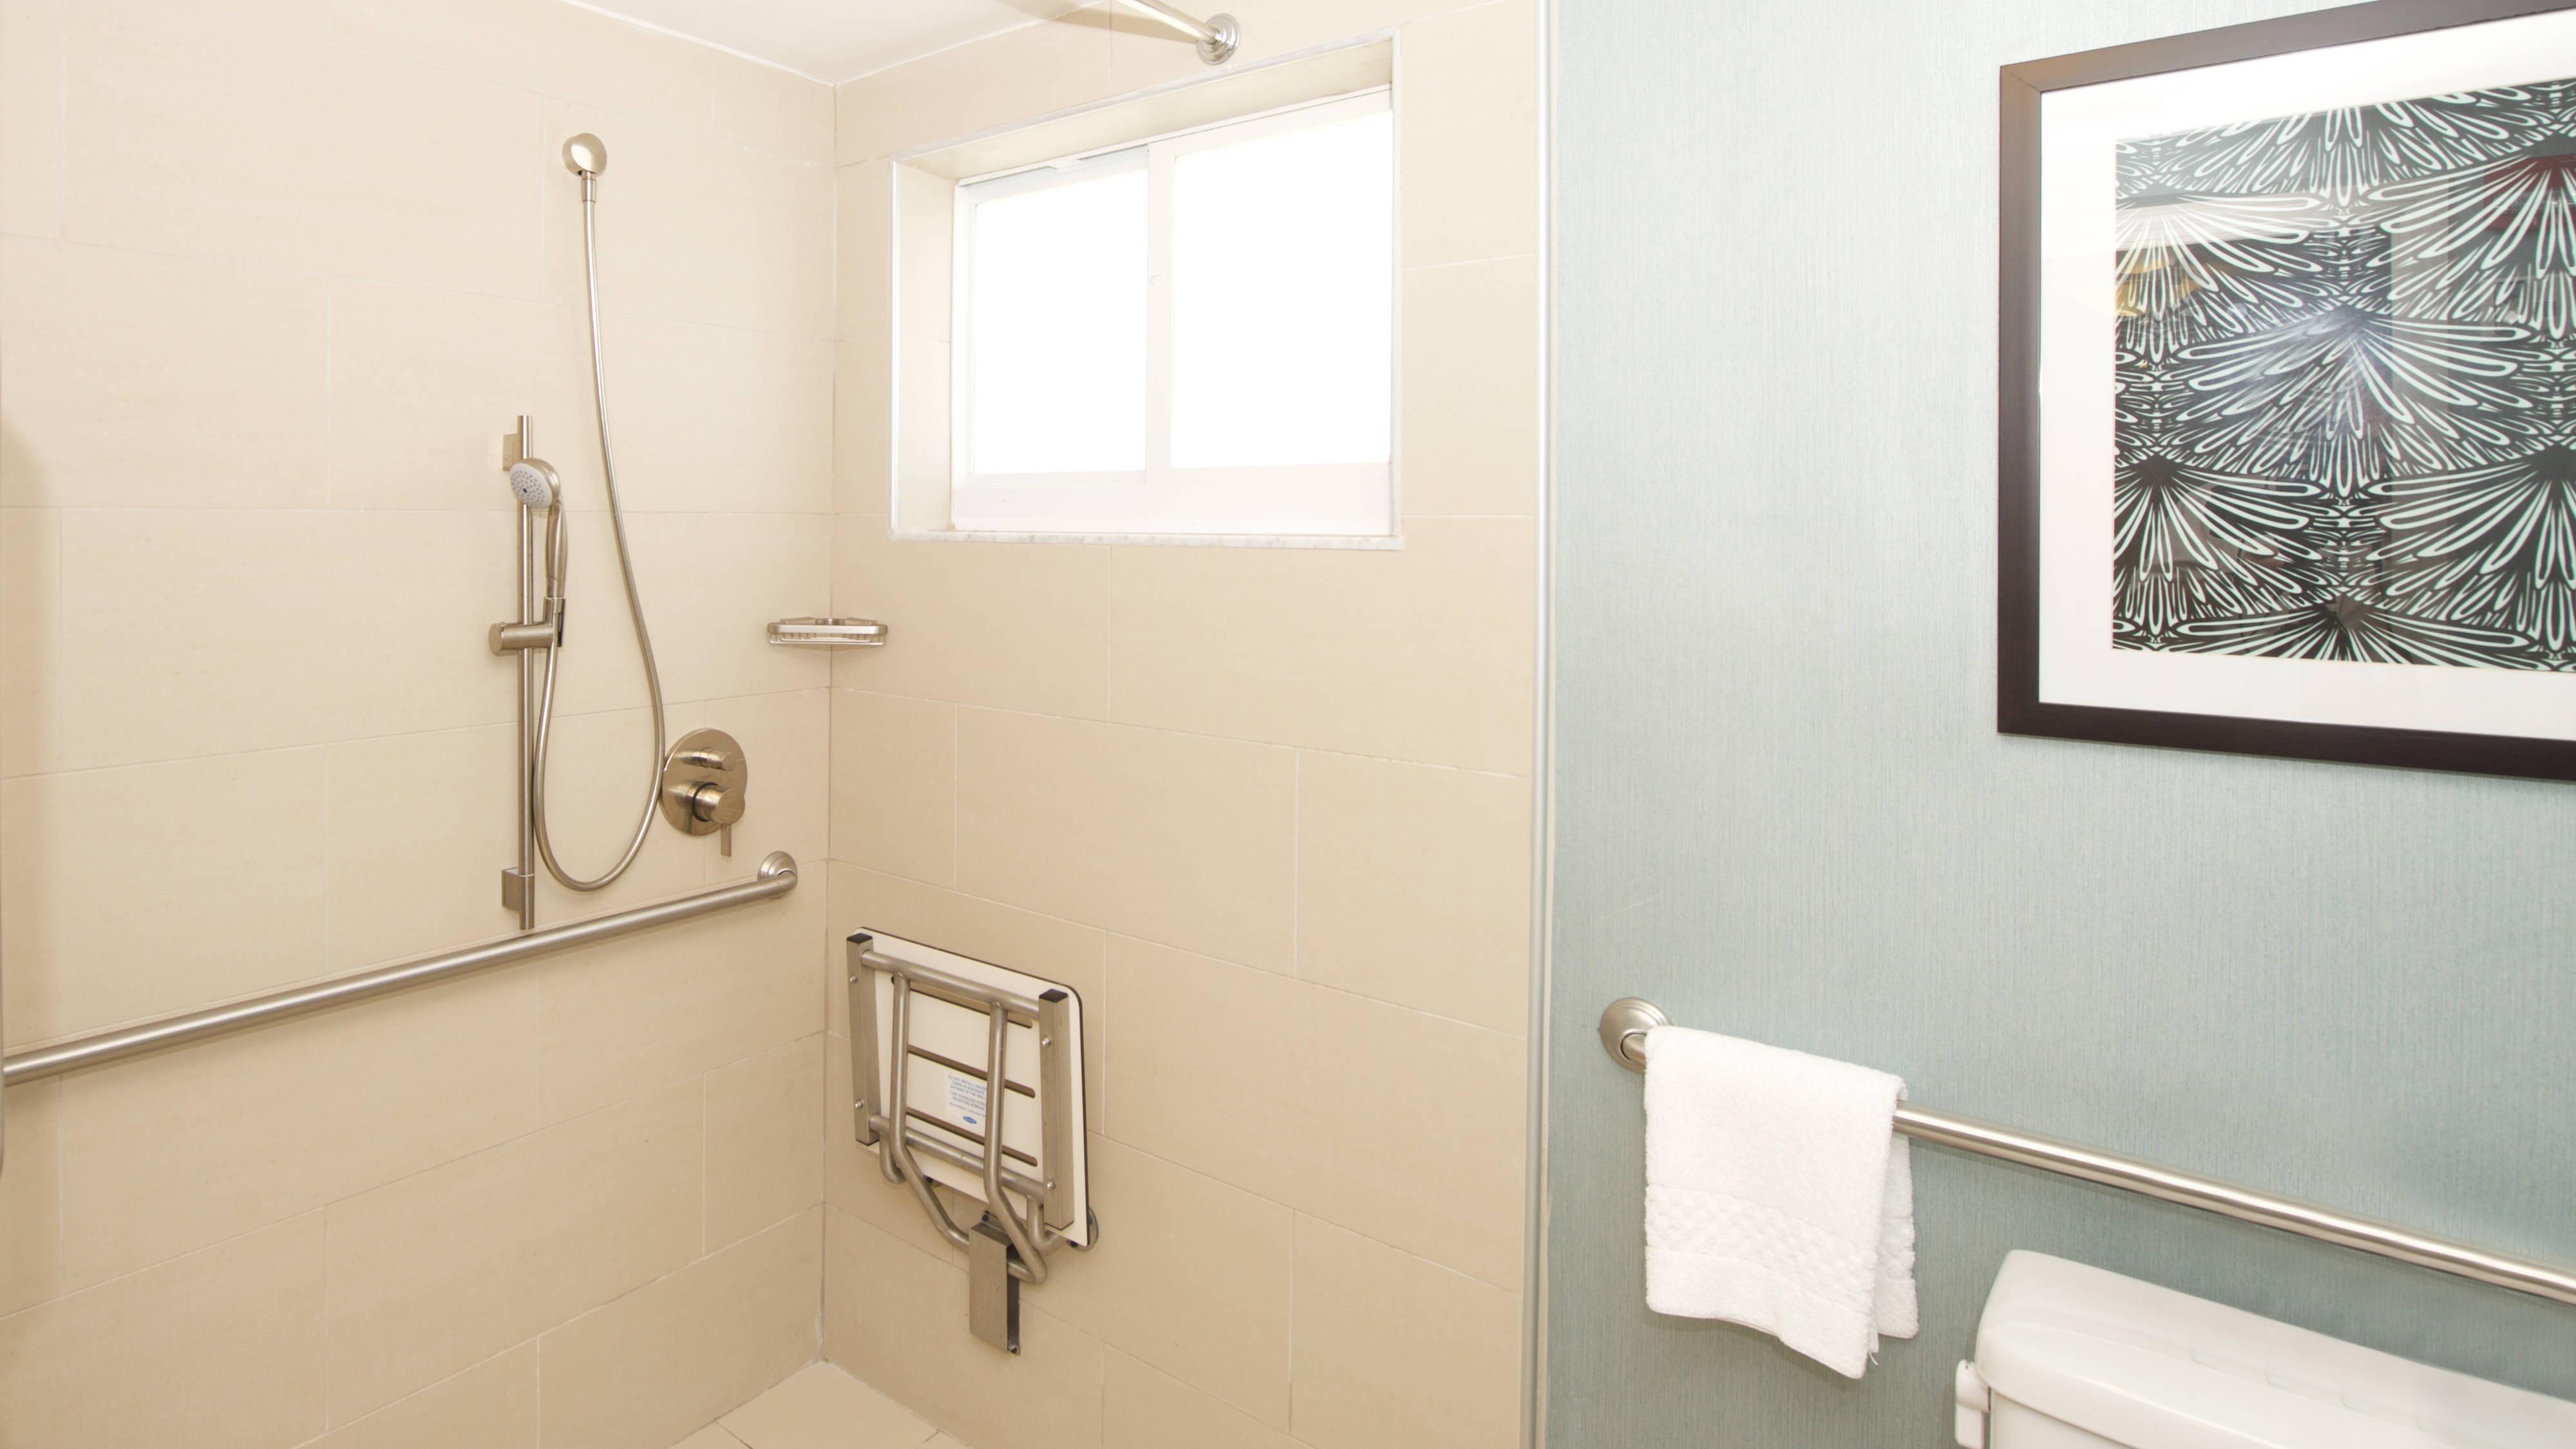 Coconut Grove Hotel ADA Bathroom